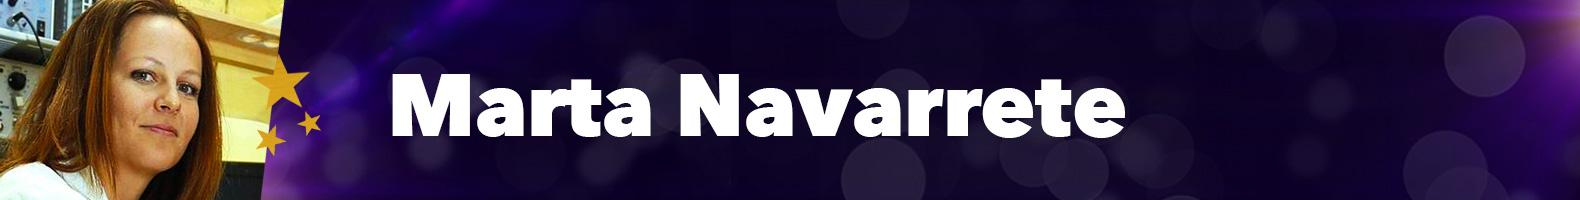 Marta-Navarrete